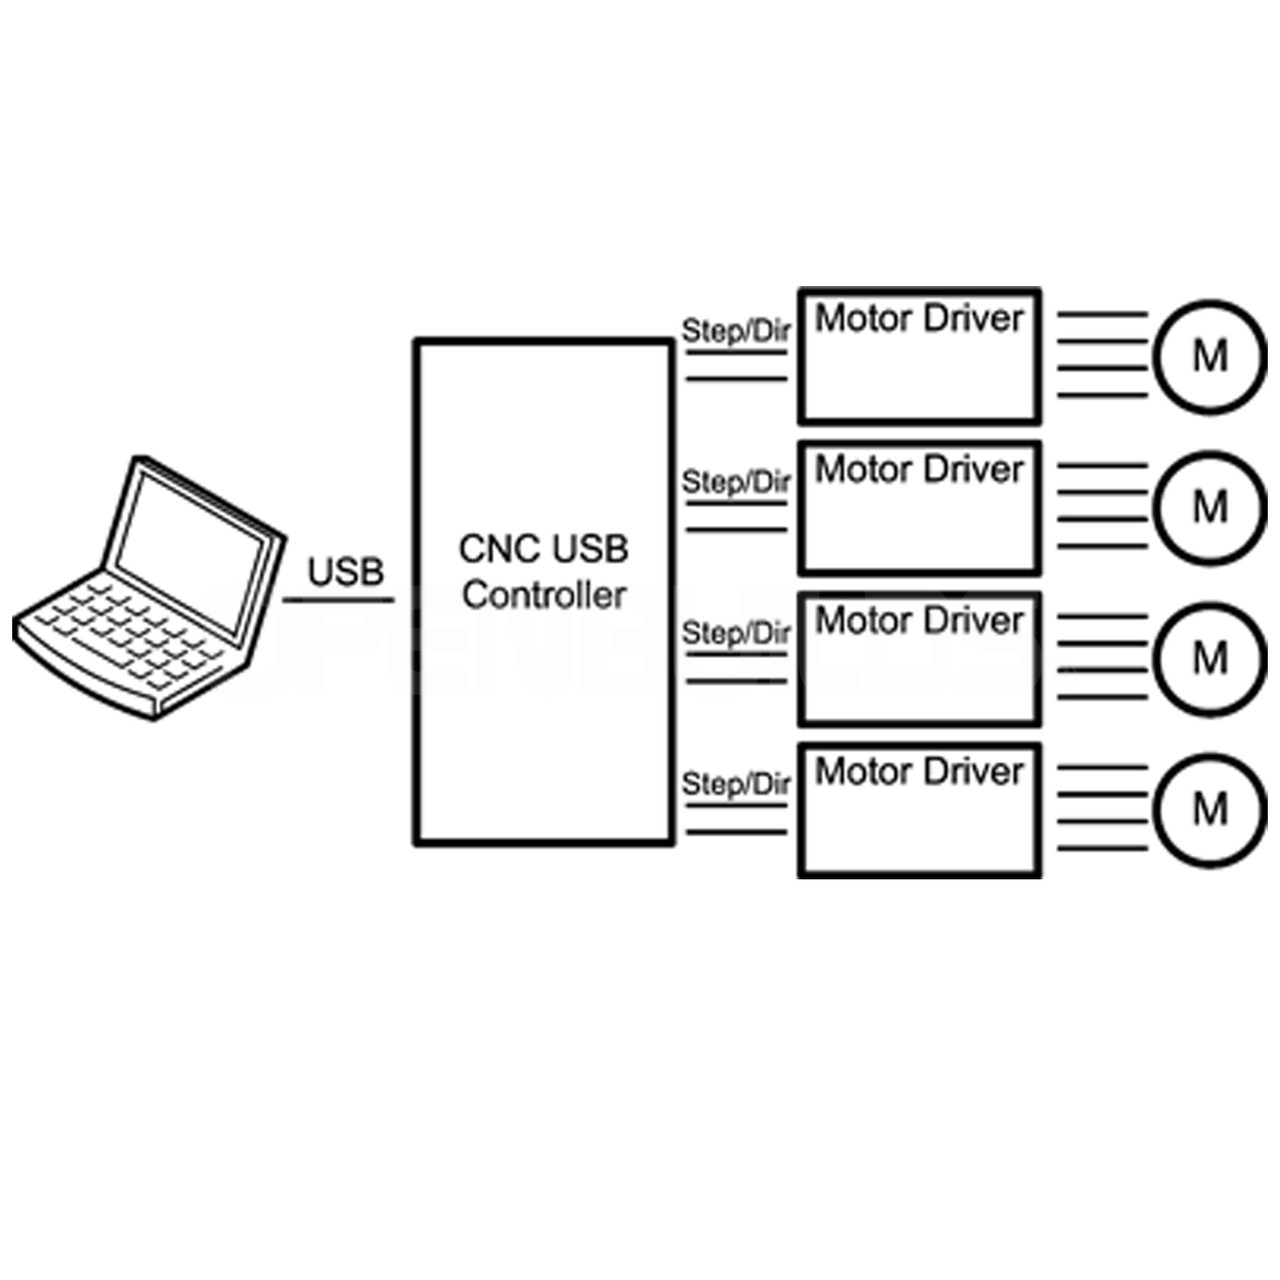 Cnc 4 Axis Wiring Diagram - Wiring Diagram Box Cnc Usb Wiring Diagram on cnc pump diagram, honeywell limit switch wire diagram, cnc power diagram, cnc control diagram, cnc controller diagram, cnc block diagram, cnc mill diagram, mesa 7i77 cnc wire diagram, cnc machine diagram, cnc router diagram, motor control diagram, laser cutting diagram, cnc parts, router connection diagram, cnc servo diagram, cnc stepper motor circuit diagram,